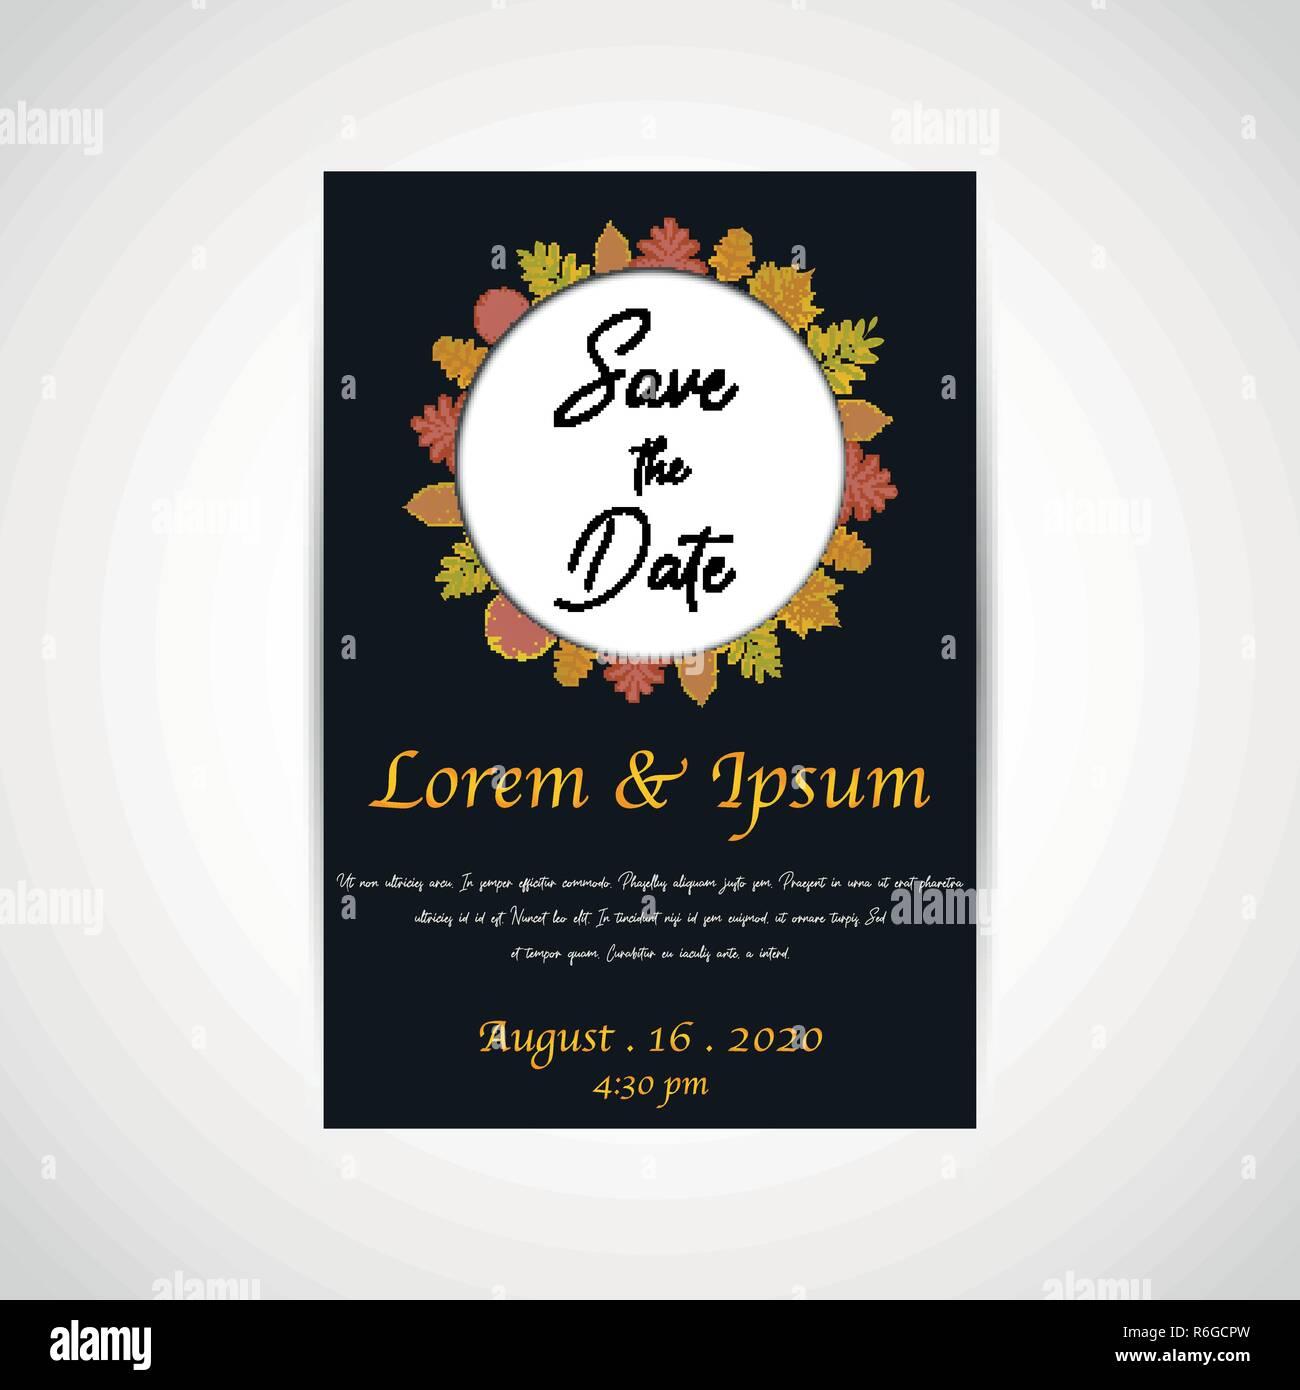 Wedding Save The Date Invitation Card Black Background